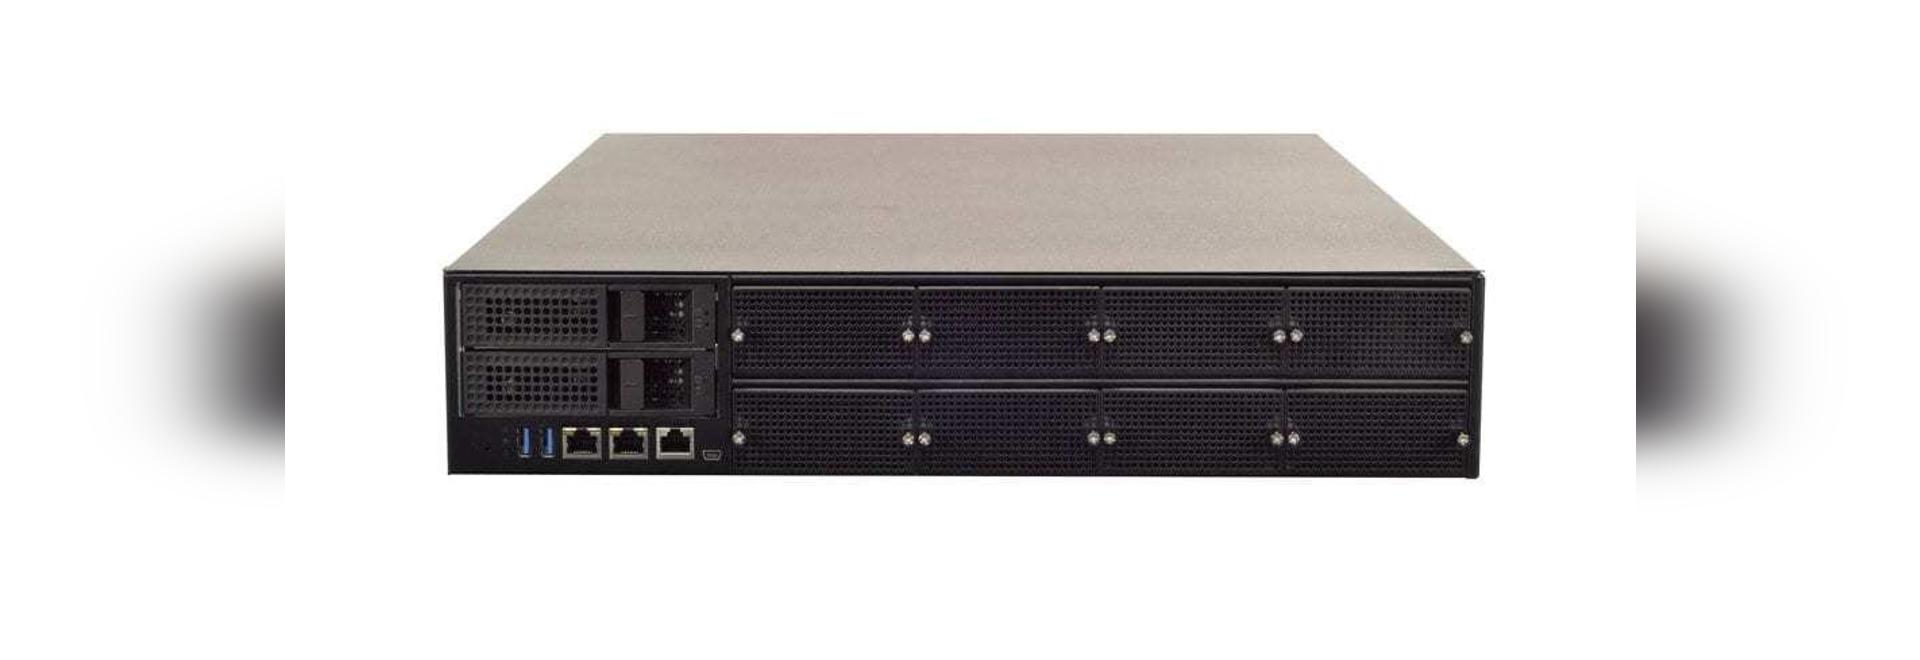 Lanner introduces NCA-6210 rackmount network appliance